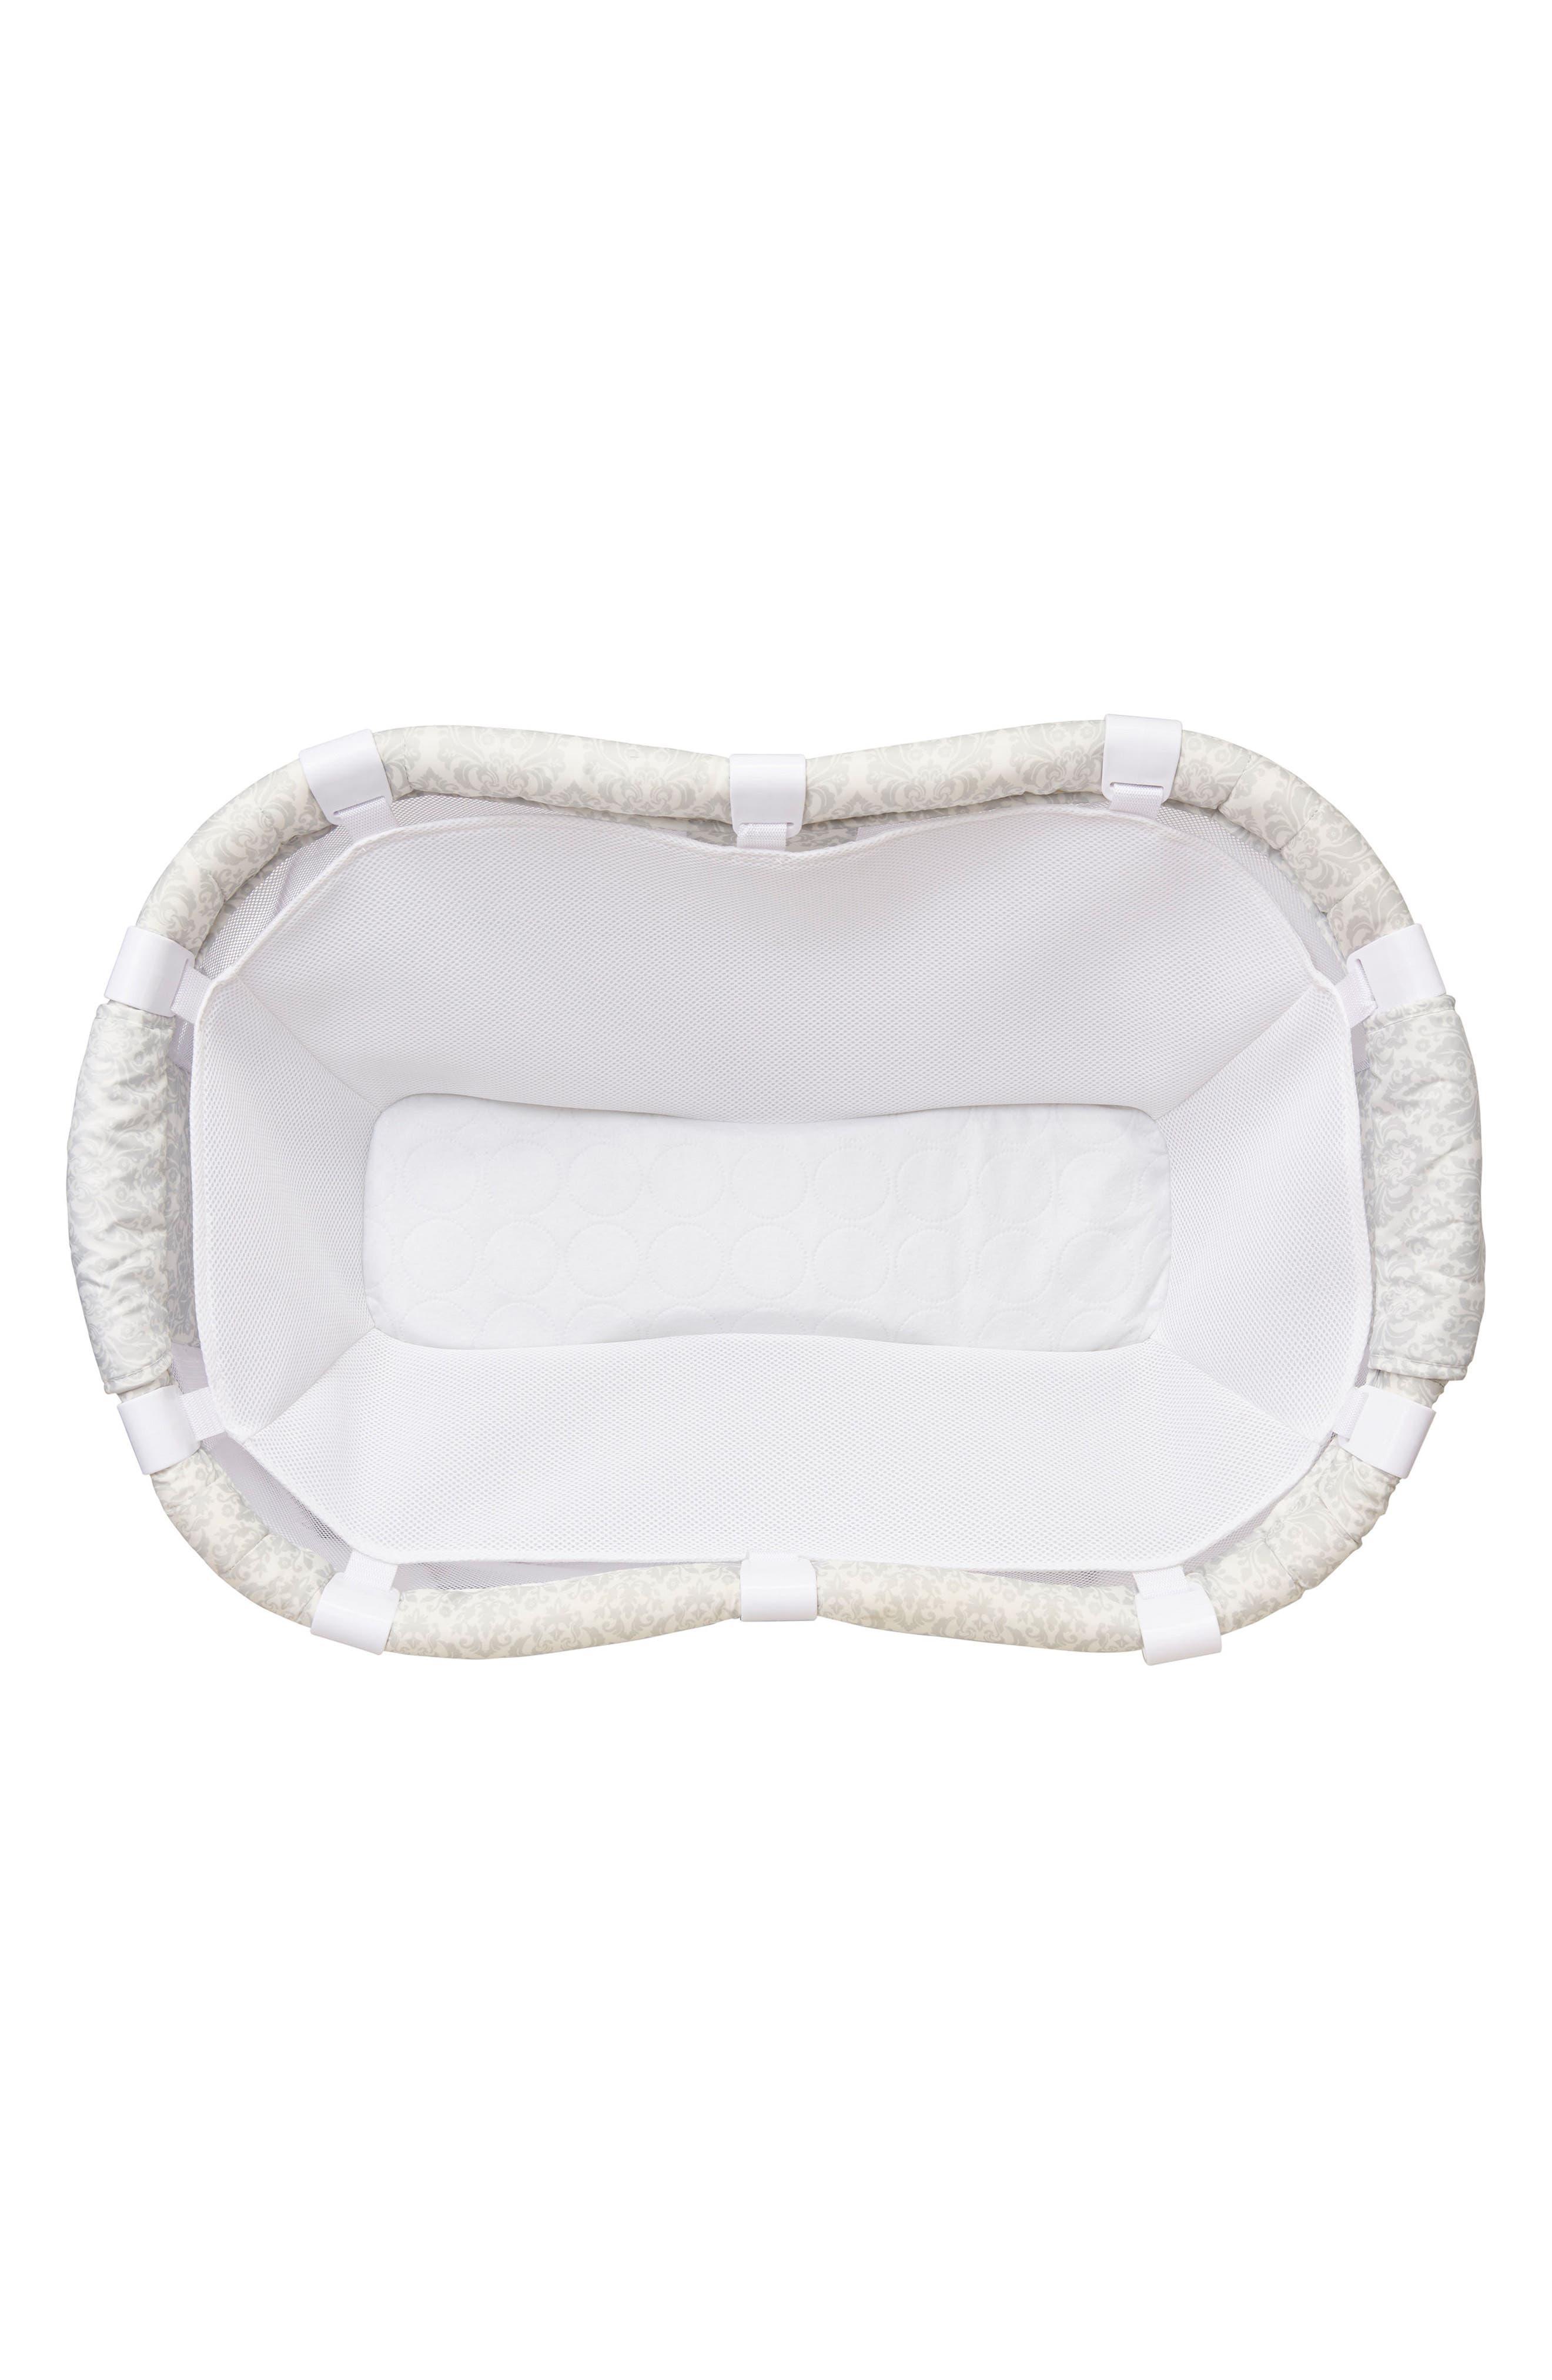 Newborn Cuddle Insert for Bassinest<sup>™</sup> Bedside Swivel Sleeper,                             Alternate thumbnail 2, color,                             WHITE MESH